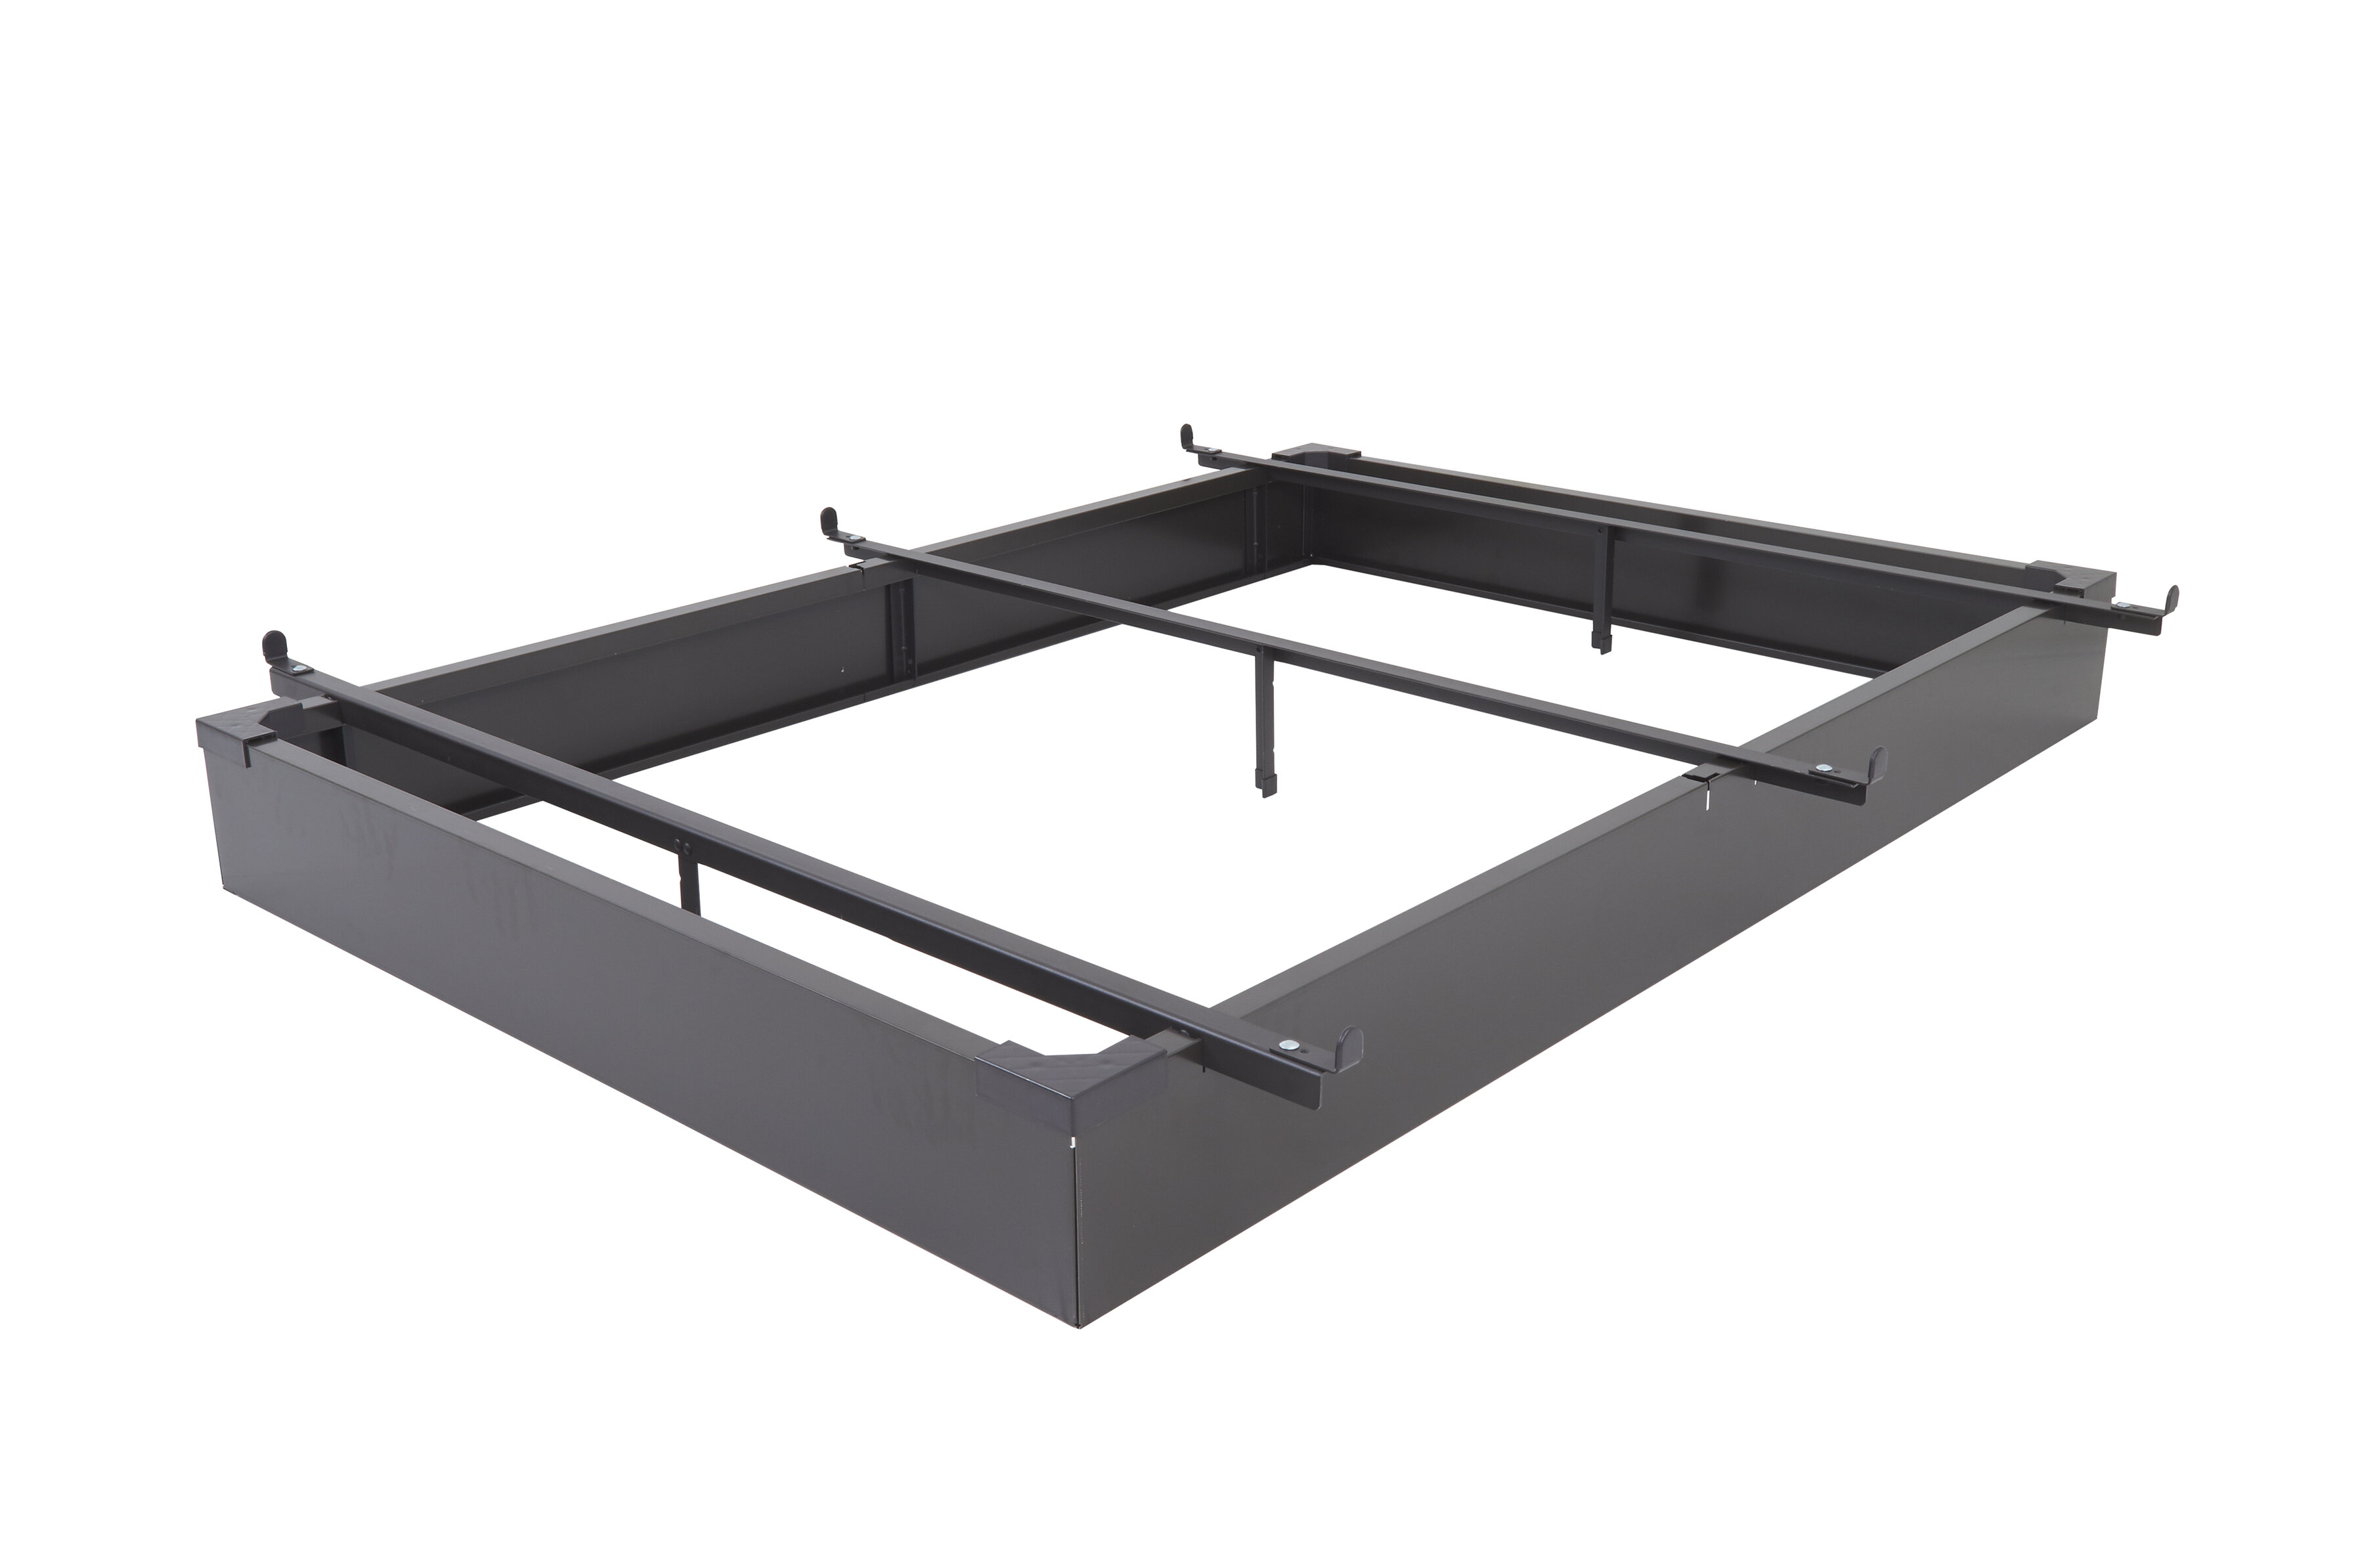 Mantua Mfg. Co. Inter-Lock Bed Frame & Reviews   Wayfair